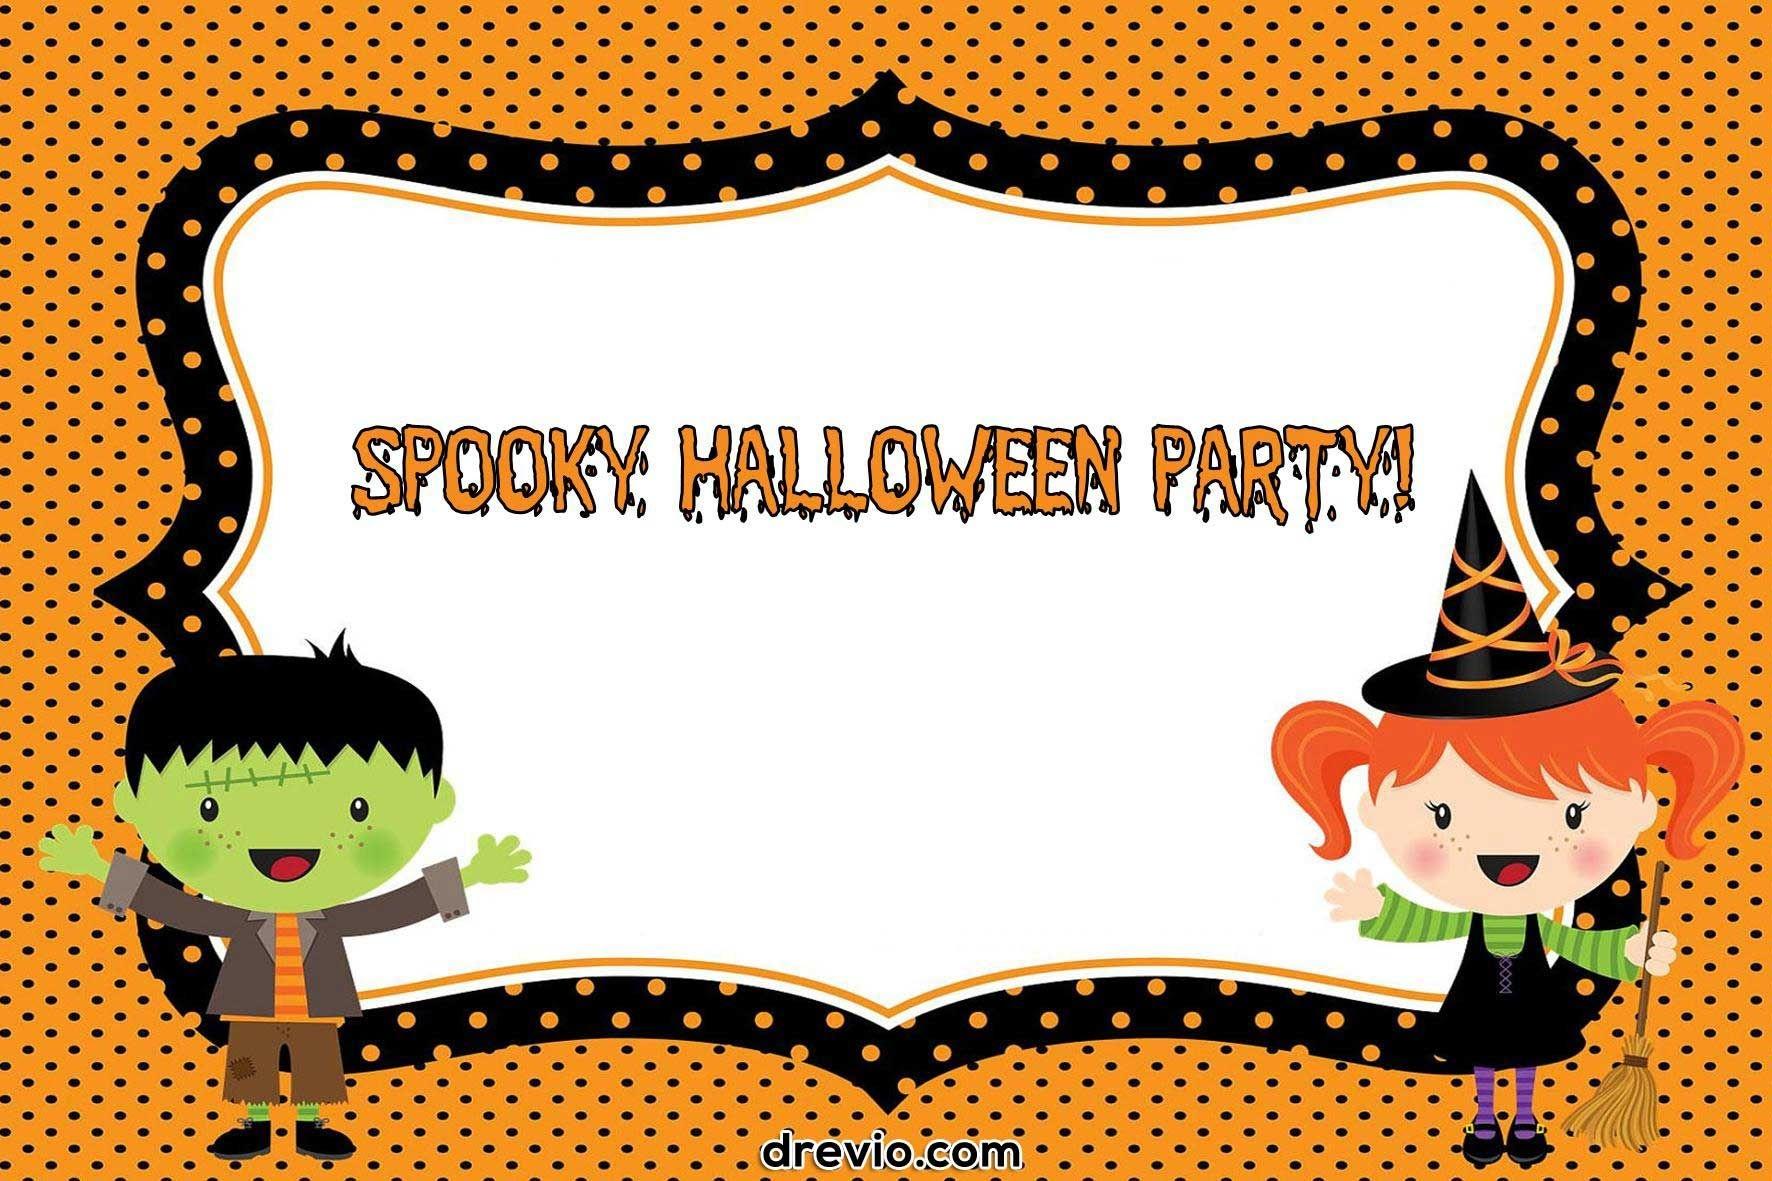 Free Printable Halloween Invitations Templates | Free Printable - Free Printable Halloween Birthday Party Invitations